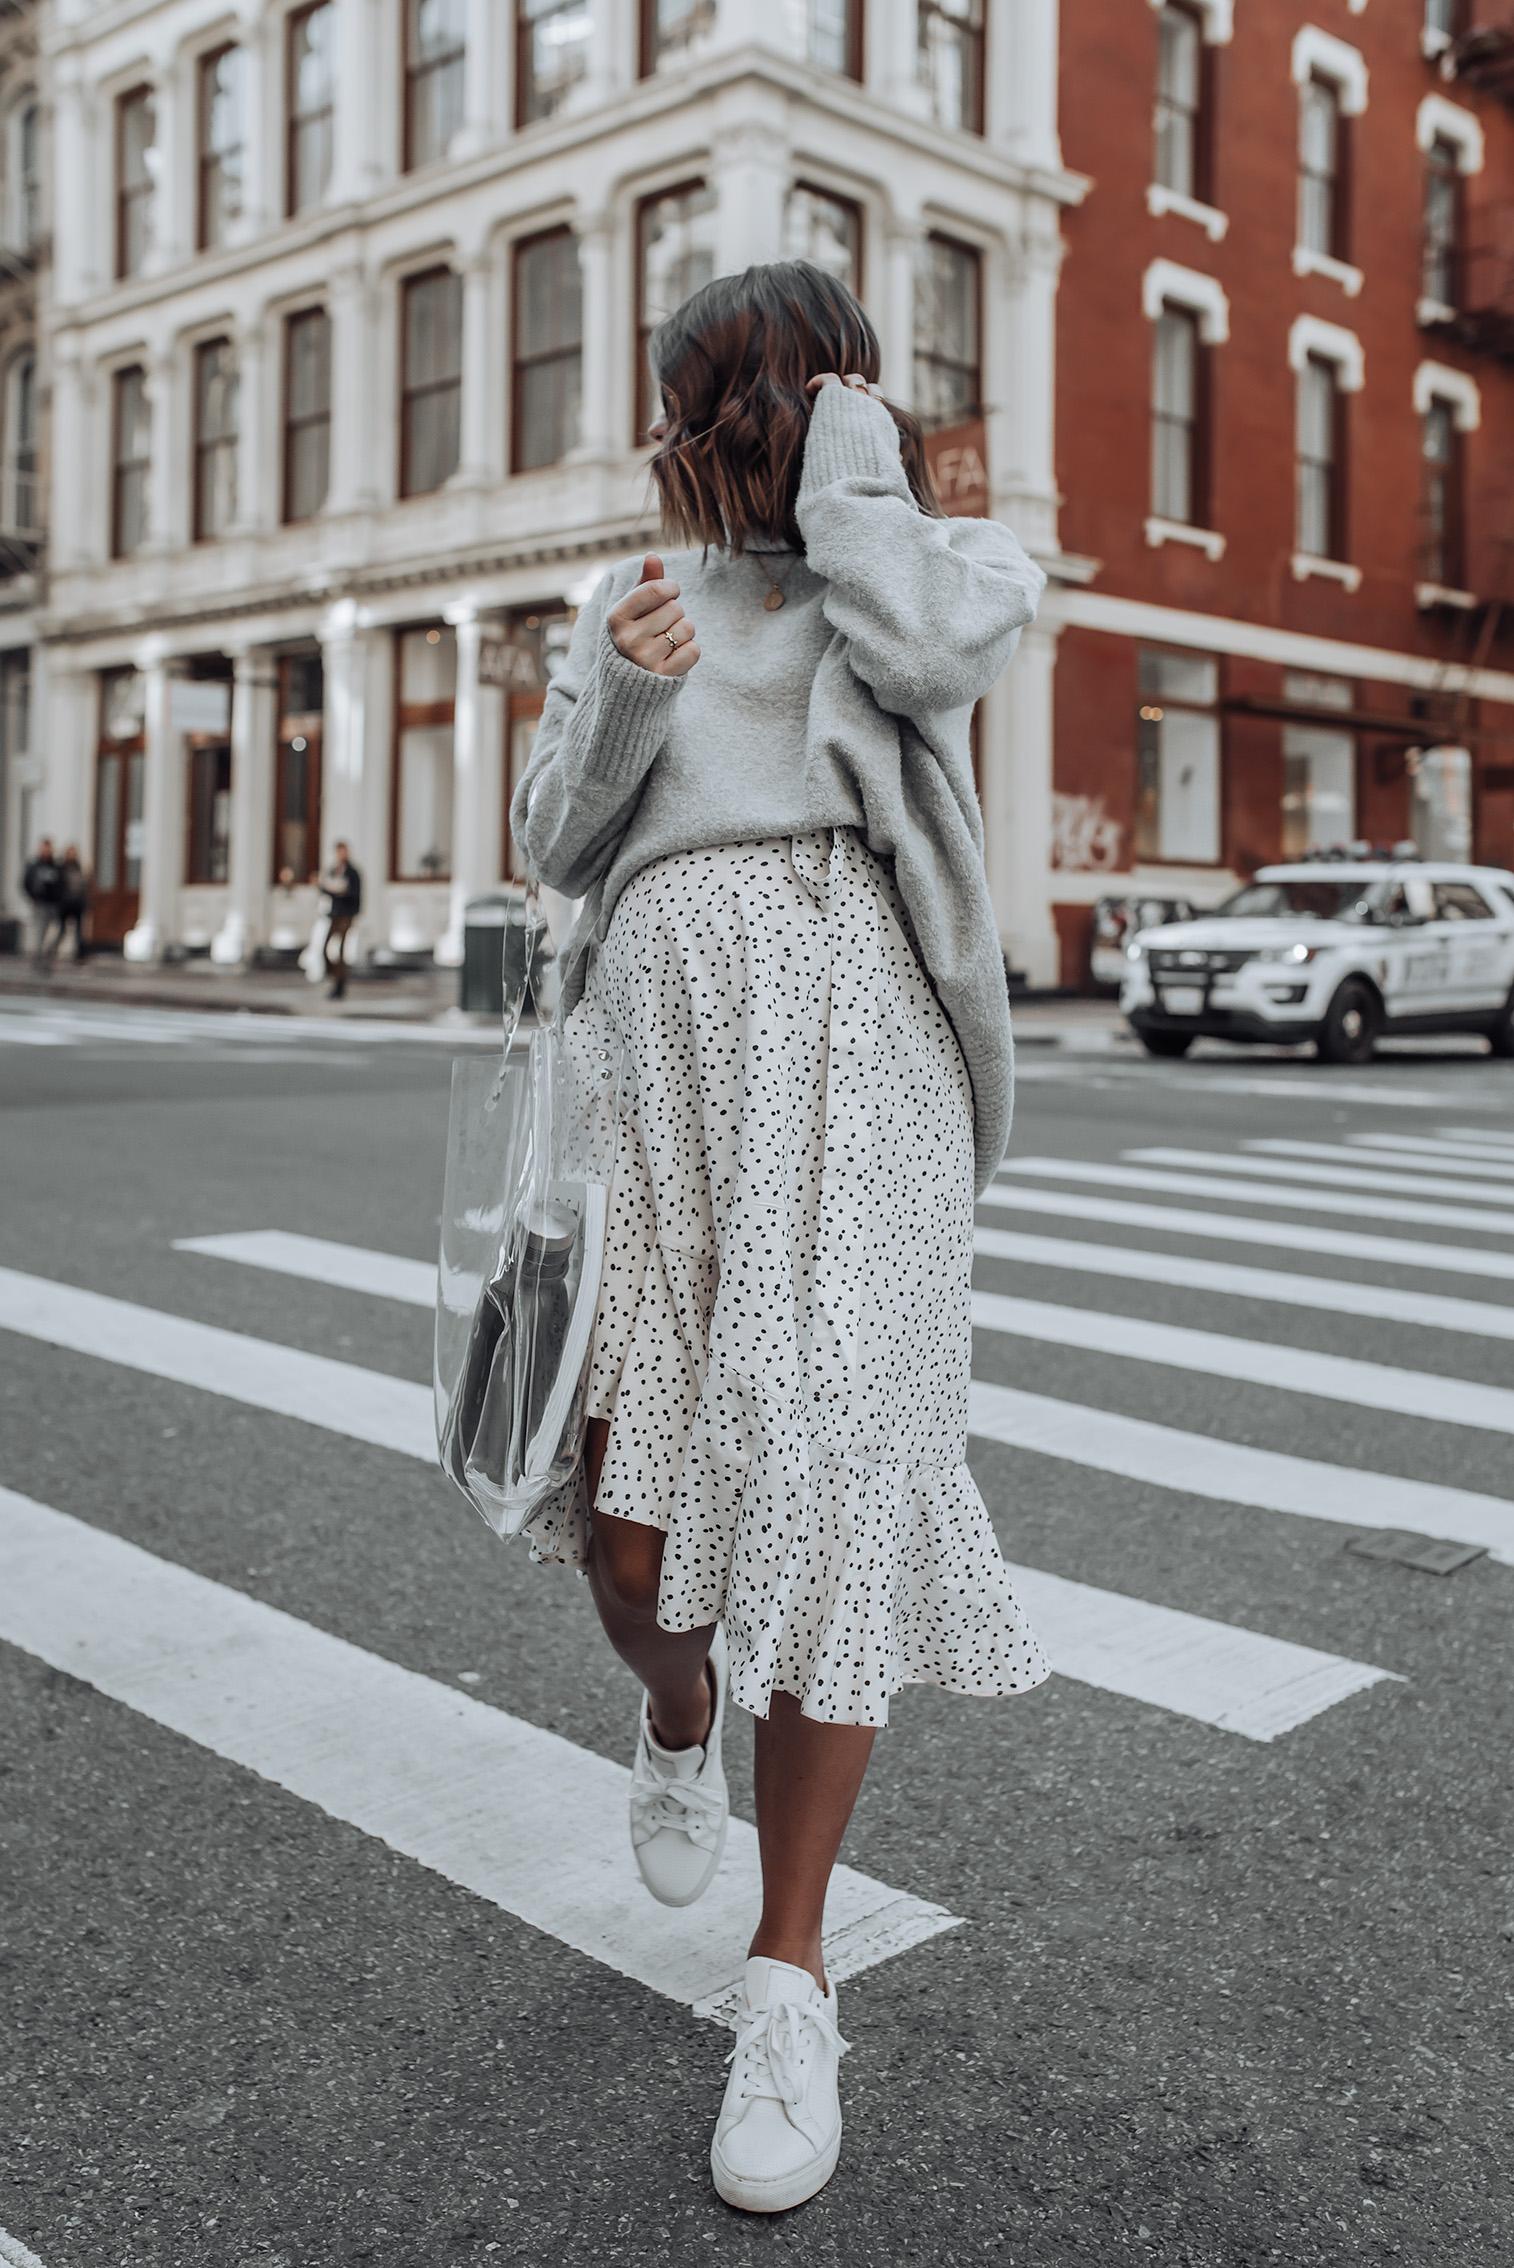 Grey Tones |Grey sweater | Polka Dot Skirt | Contigo Water Bottle | Clear Tote| Necklace #streetstyle #ootd #liketkit #polkadot #chunkyknit